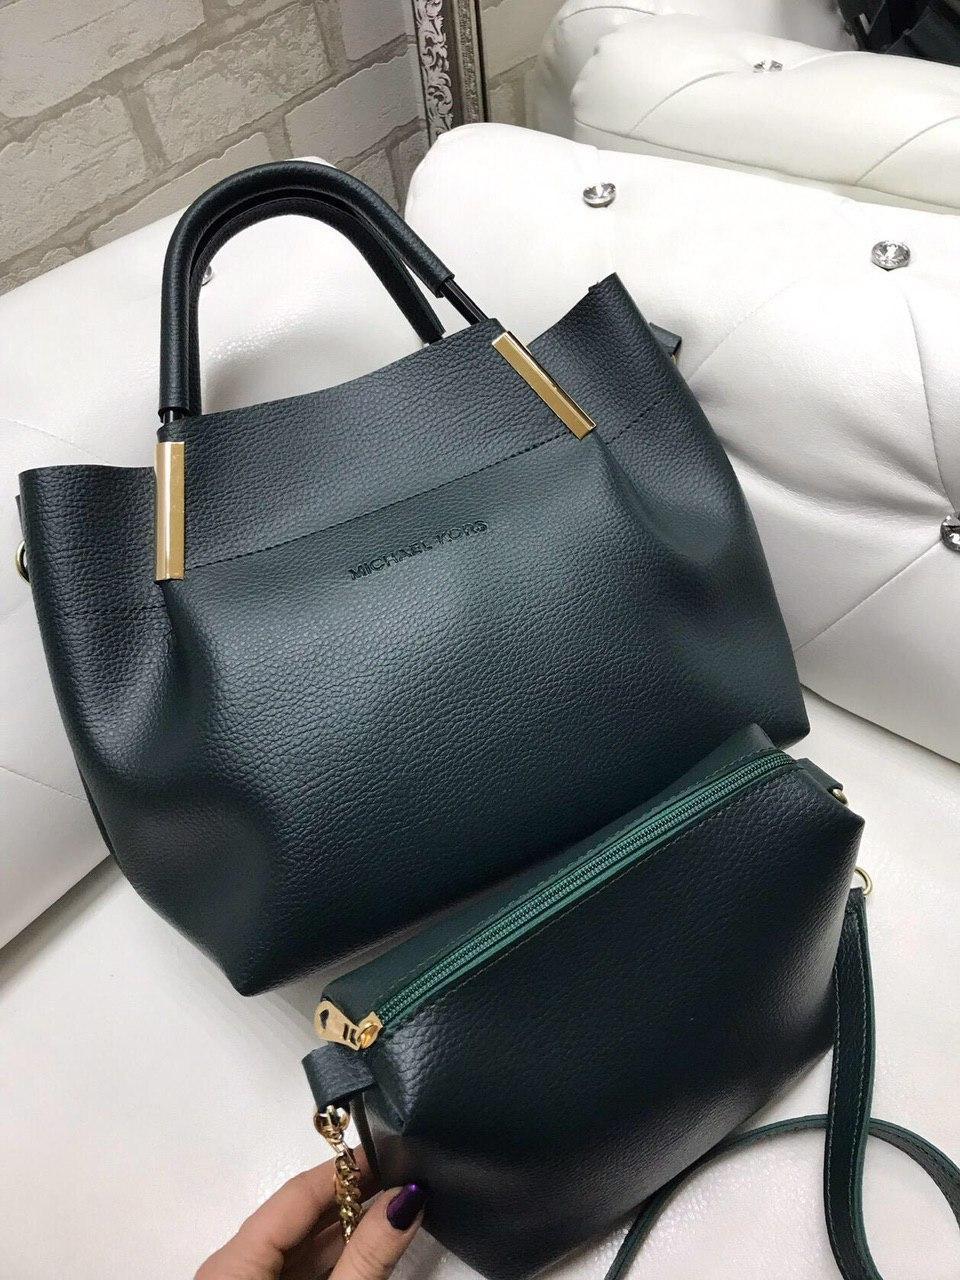 Жіноча сумка велика зелена на плече з косметичкою клатчем міська стильна набір кожзам